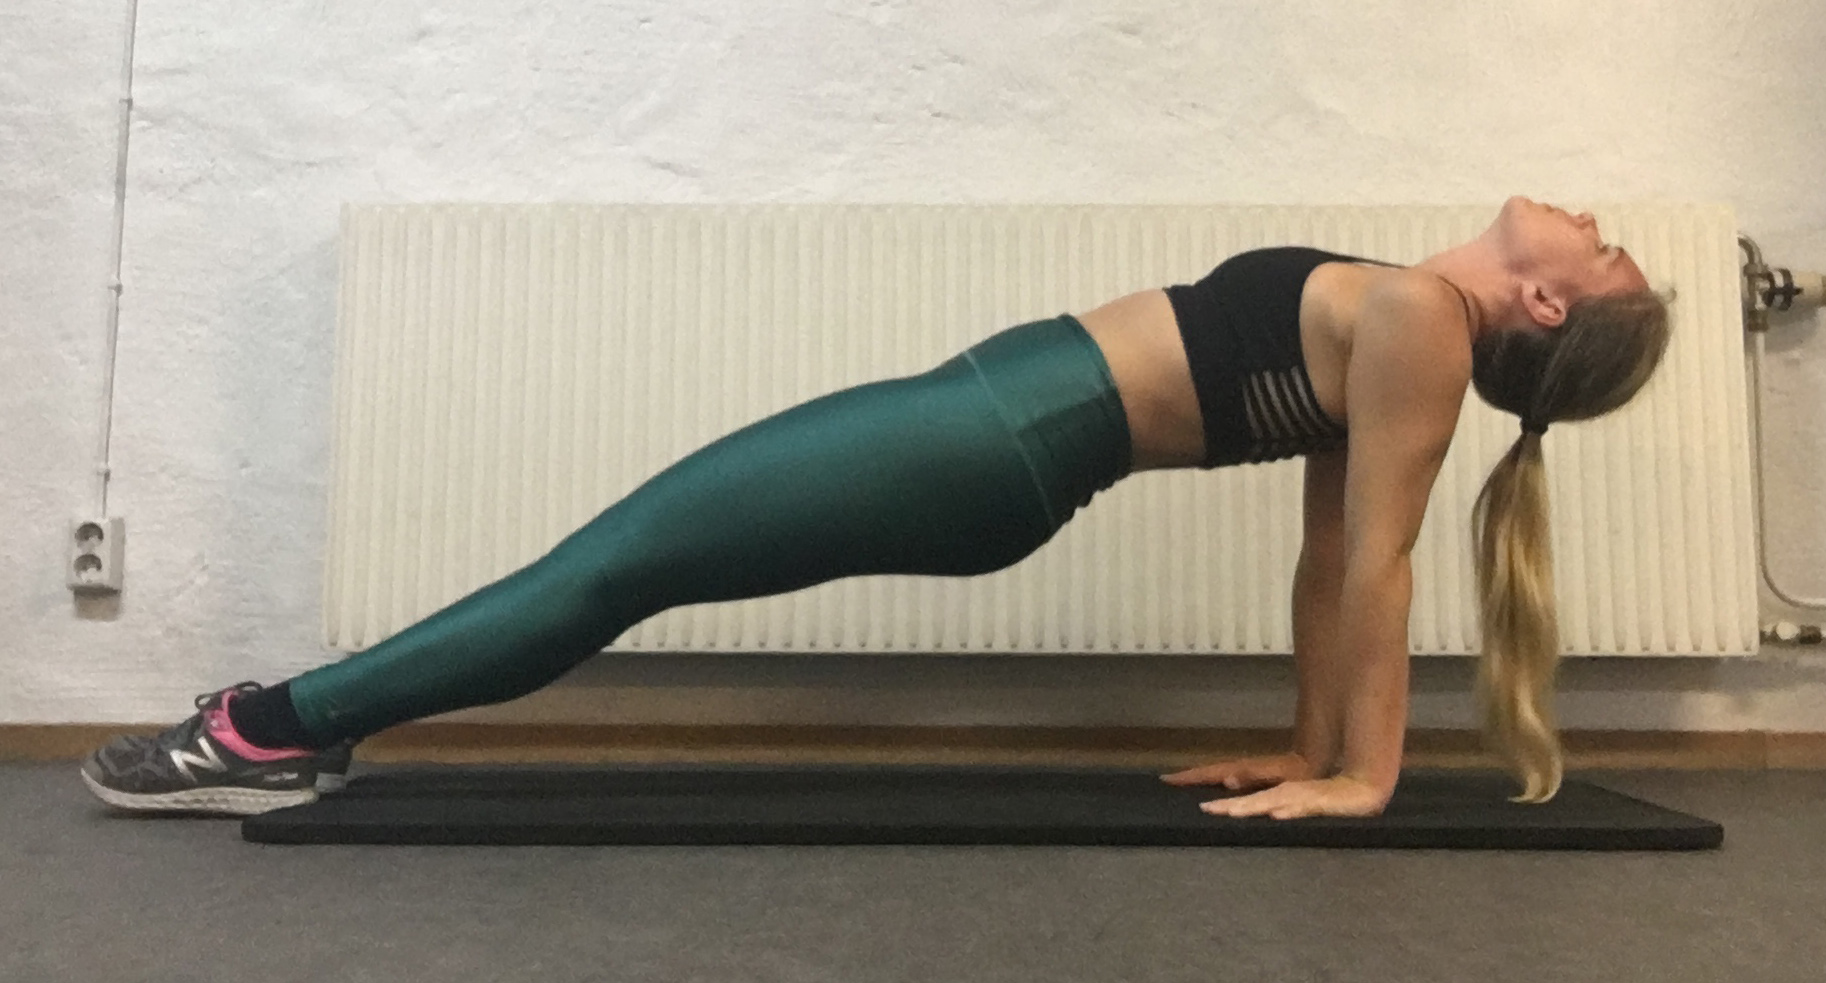 Omvänd planka yogaposition yogaövning bordet